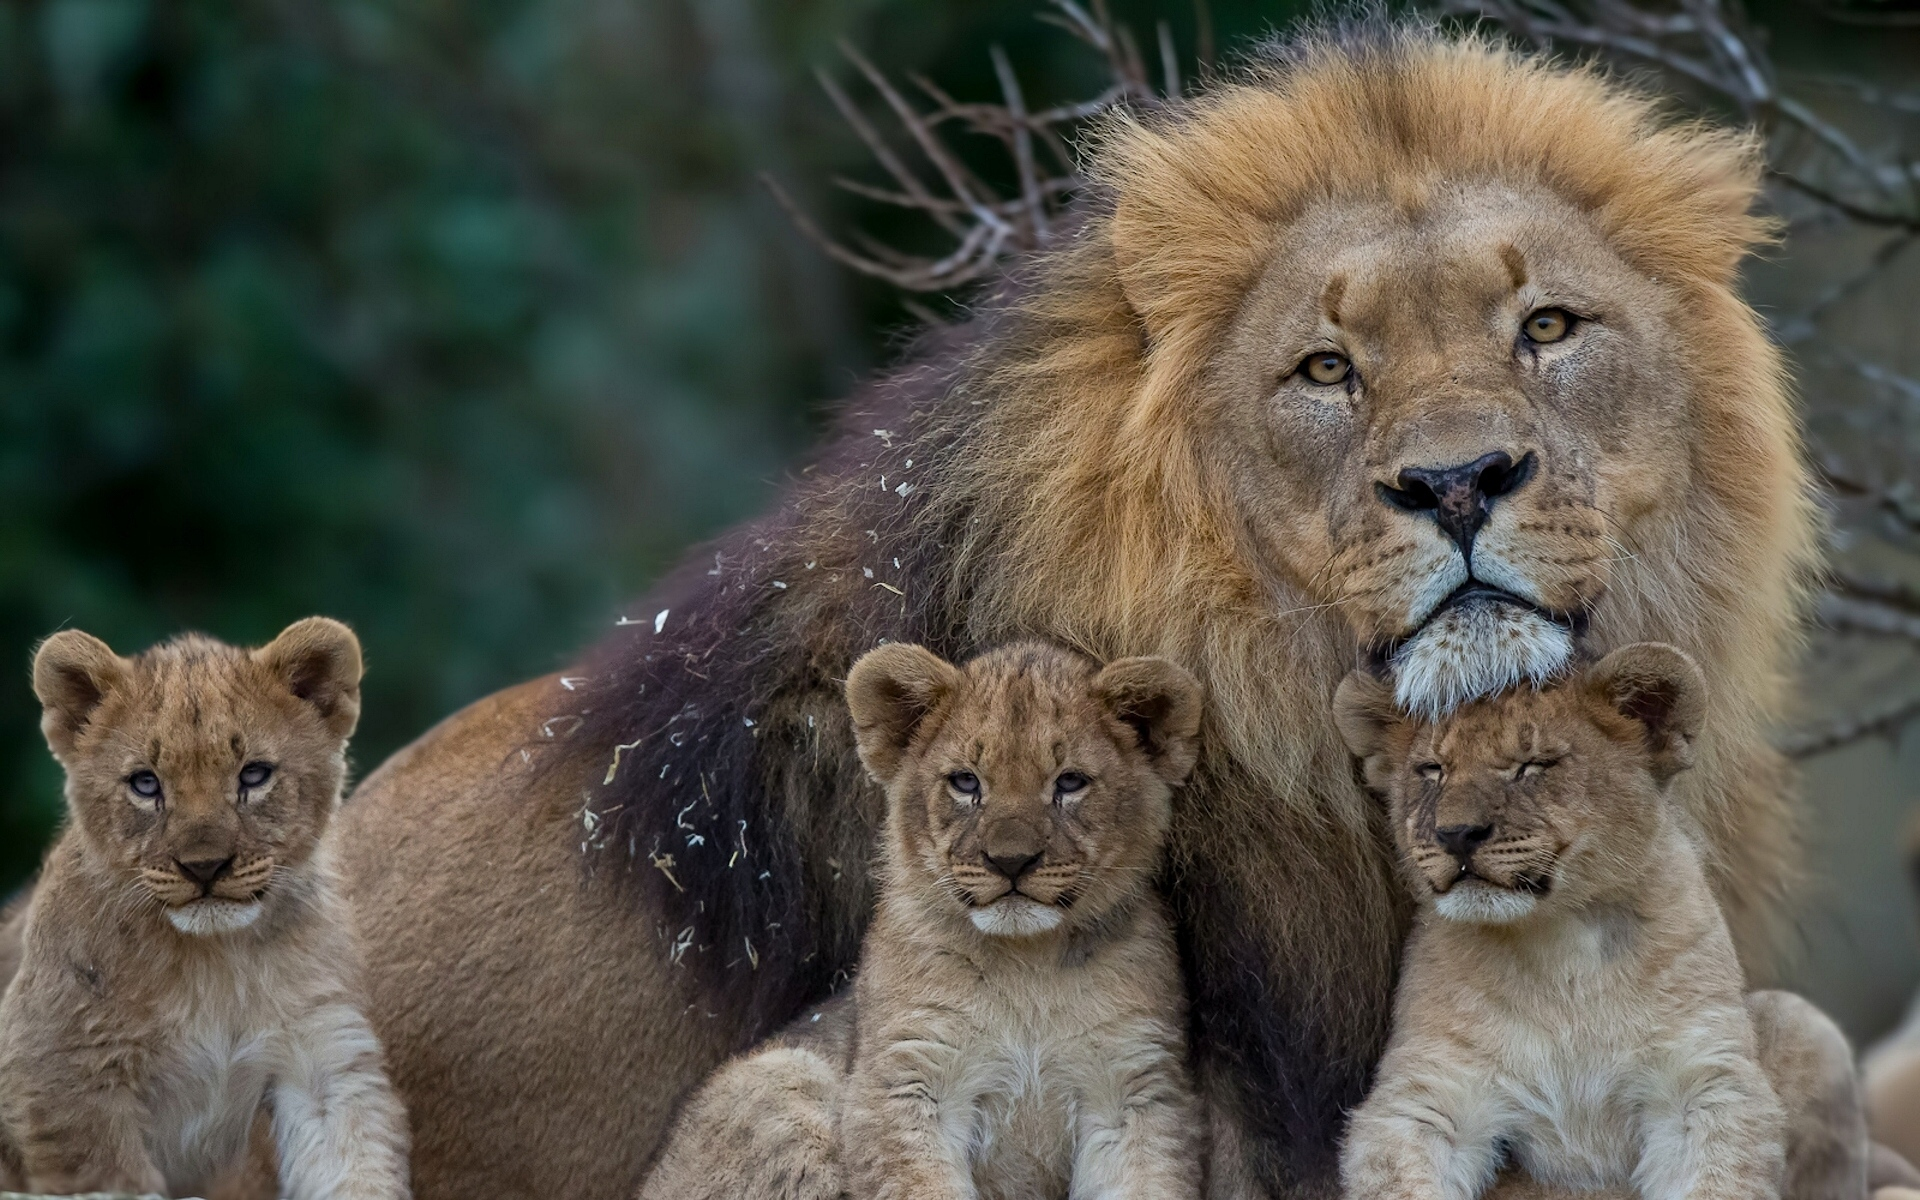 лев и львенок фото